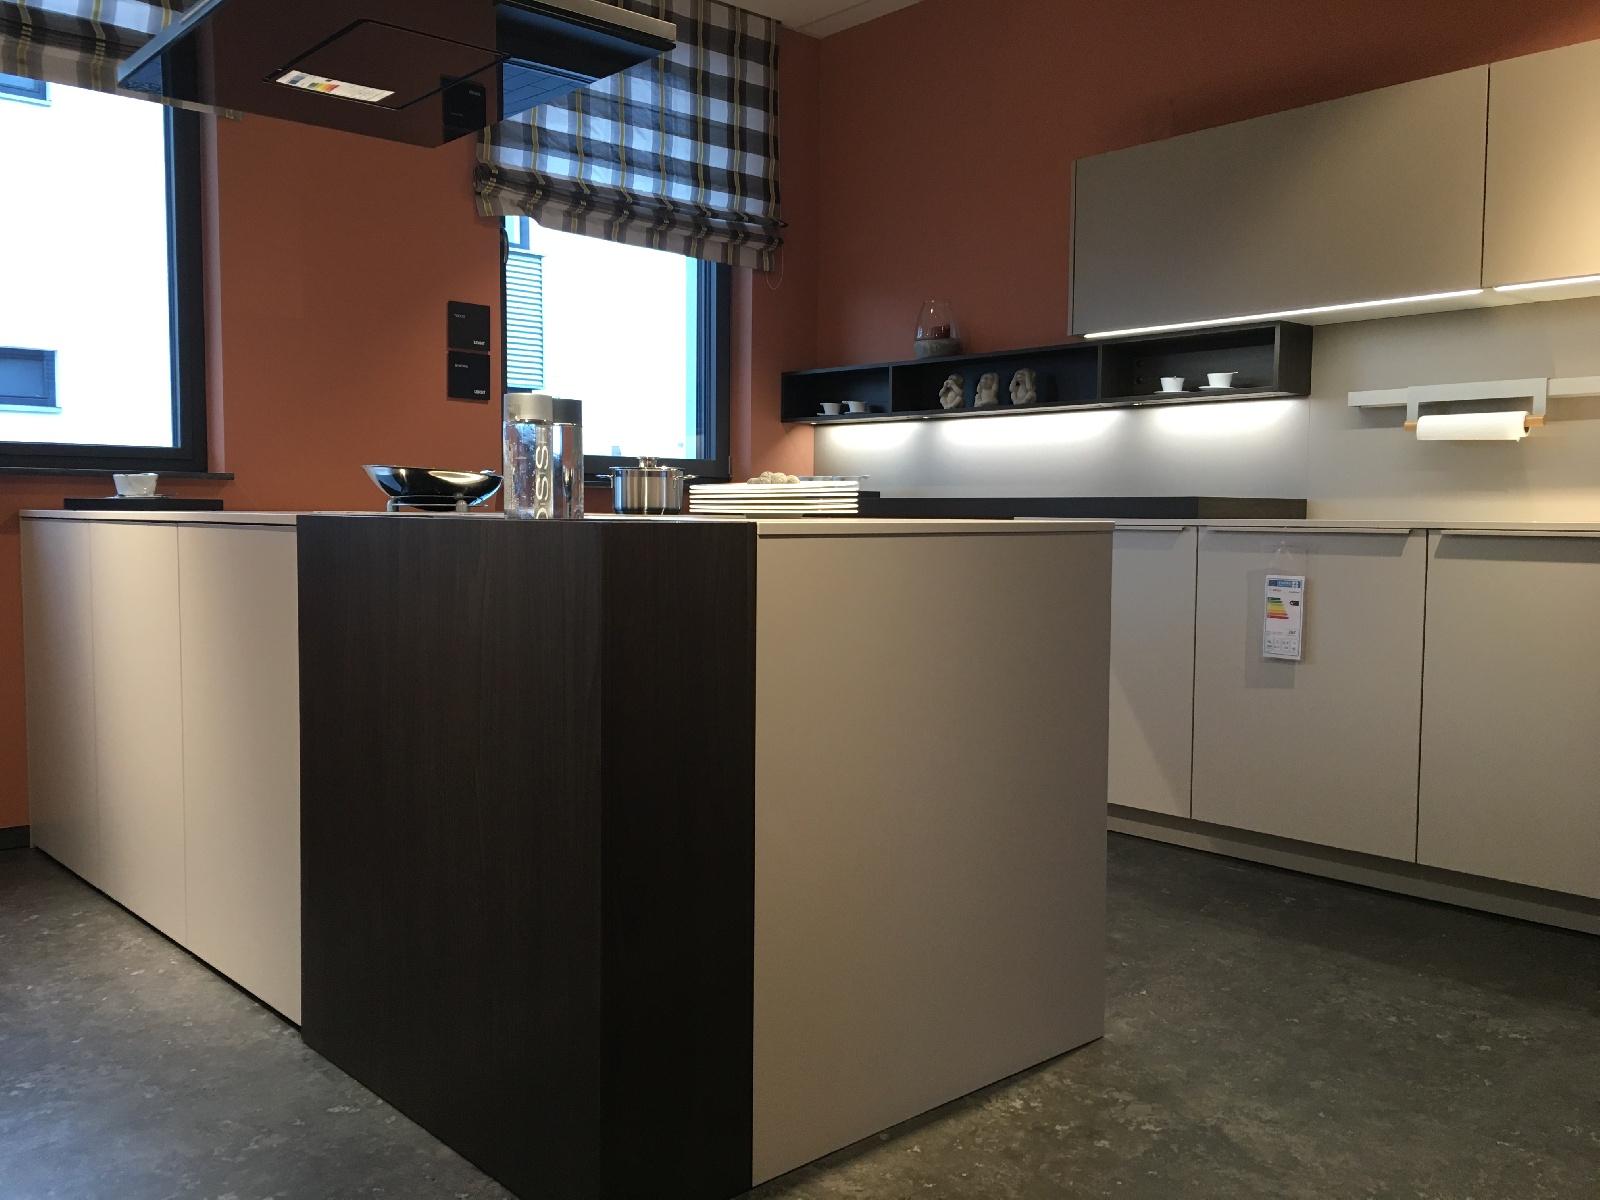 k che creativ schwabenheimer weg 62a 55543 bad kreuznach. Black Bedroom Furniture Sets. Home Design Ideas